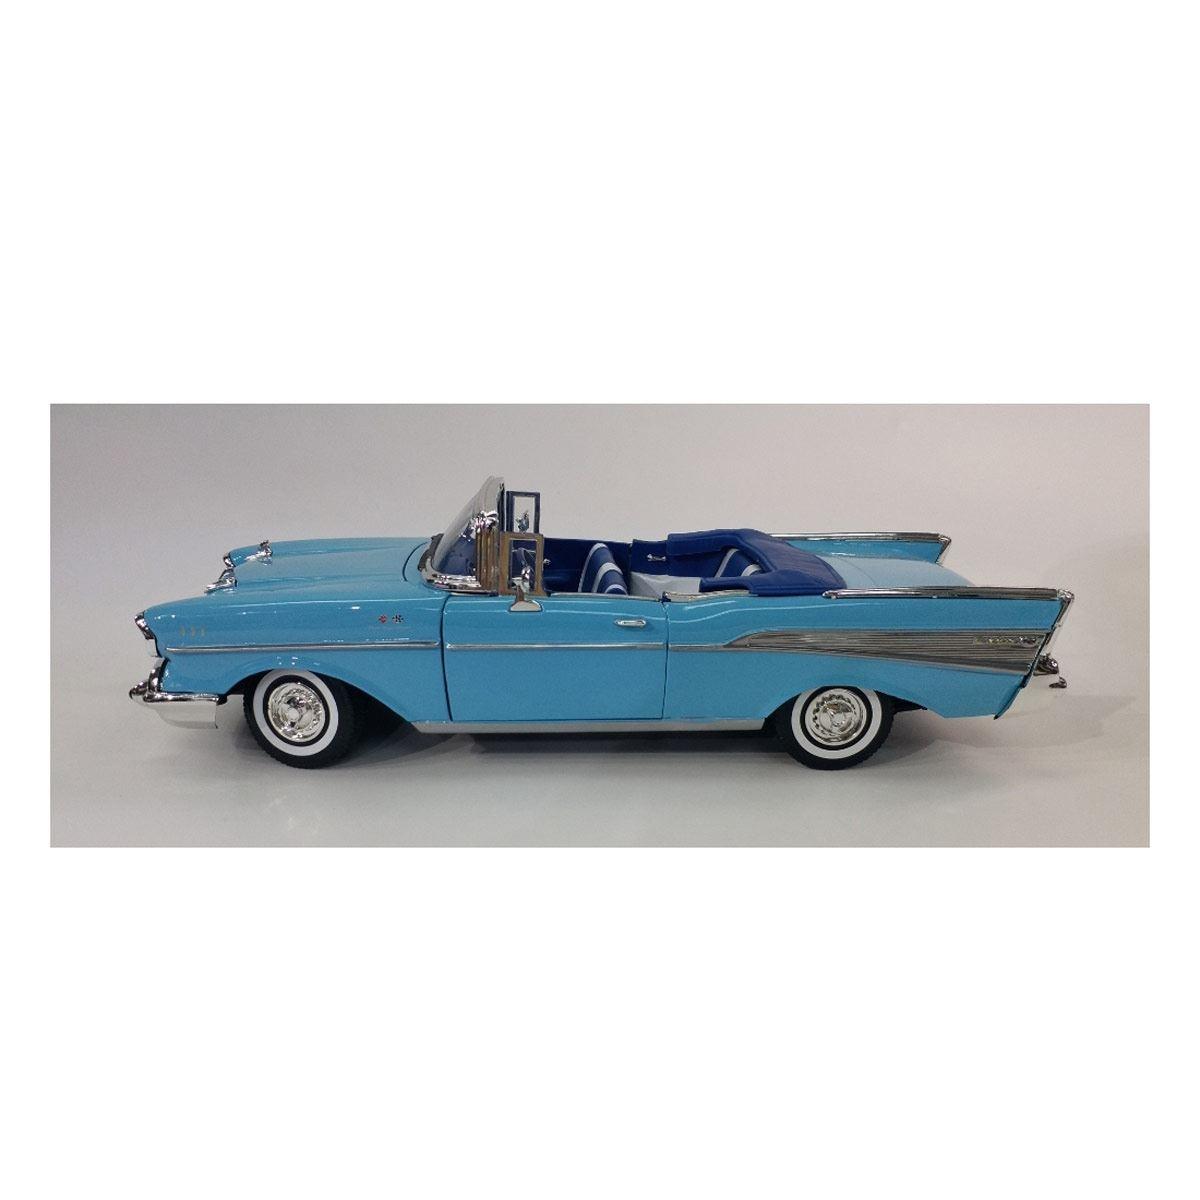 1:18 1957 Chevy Bel Air (Convertible)